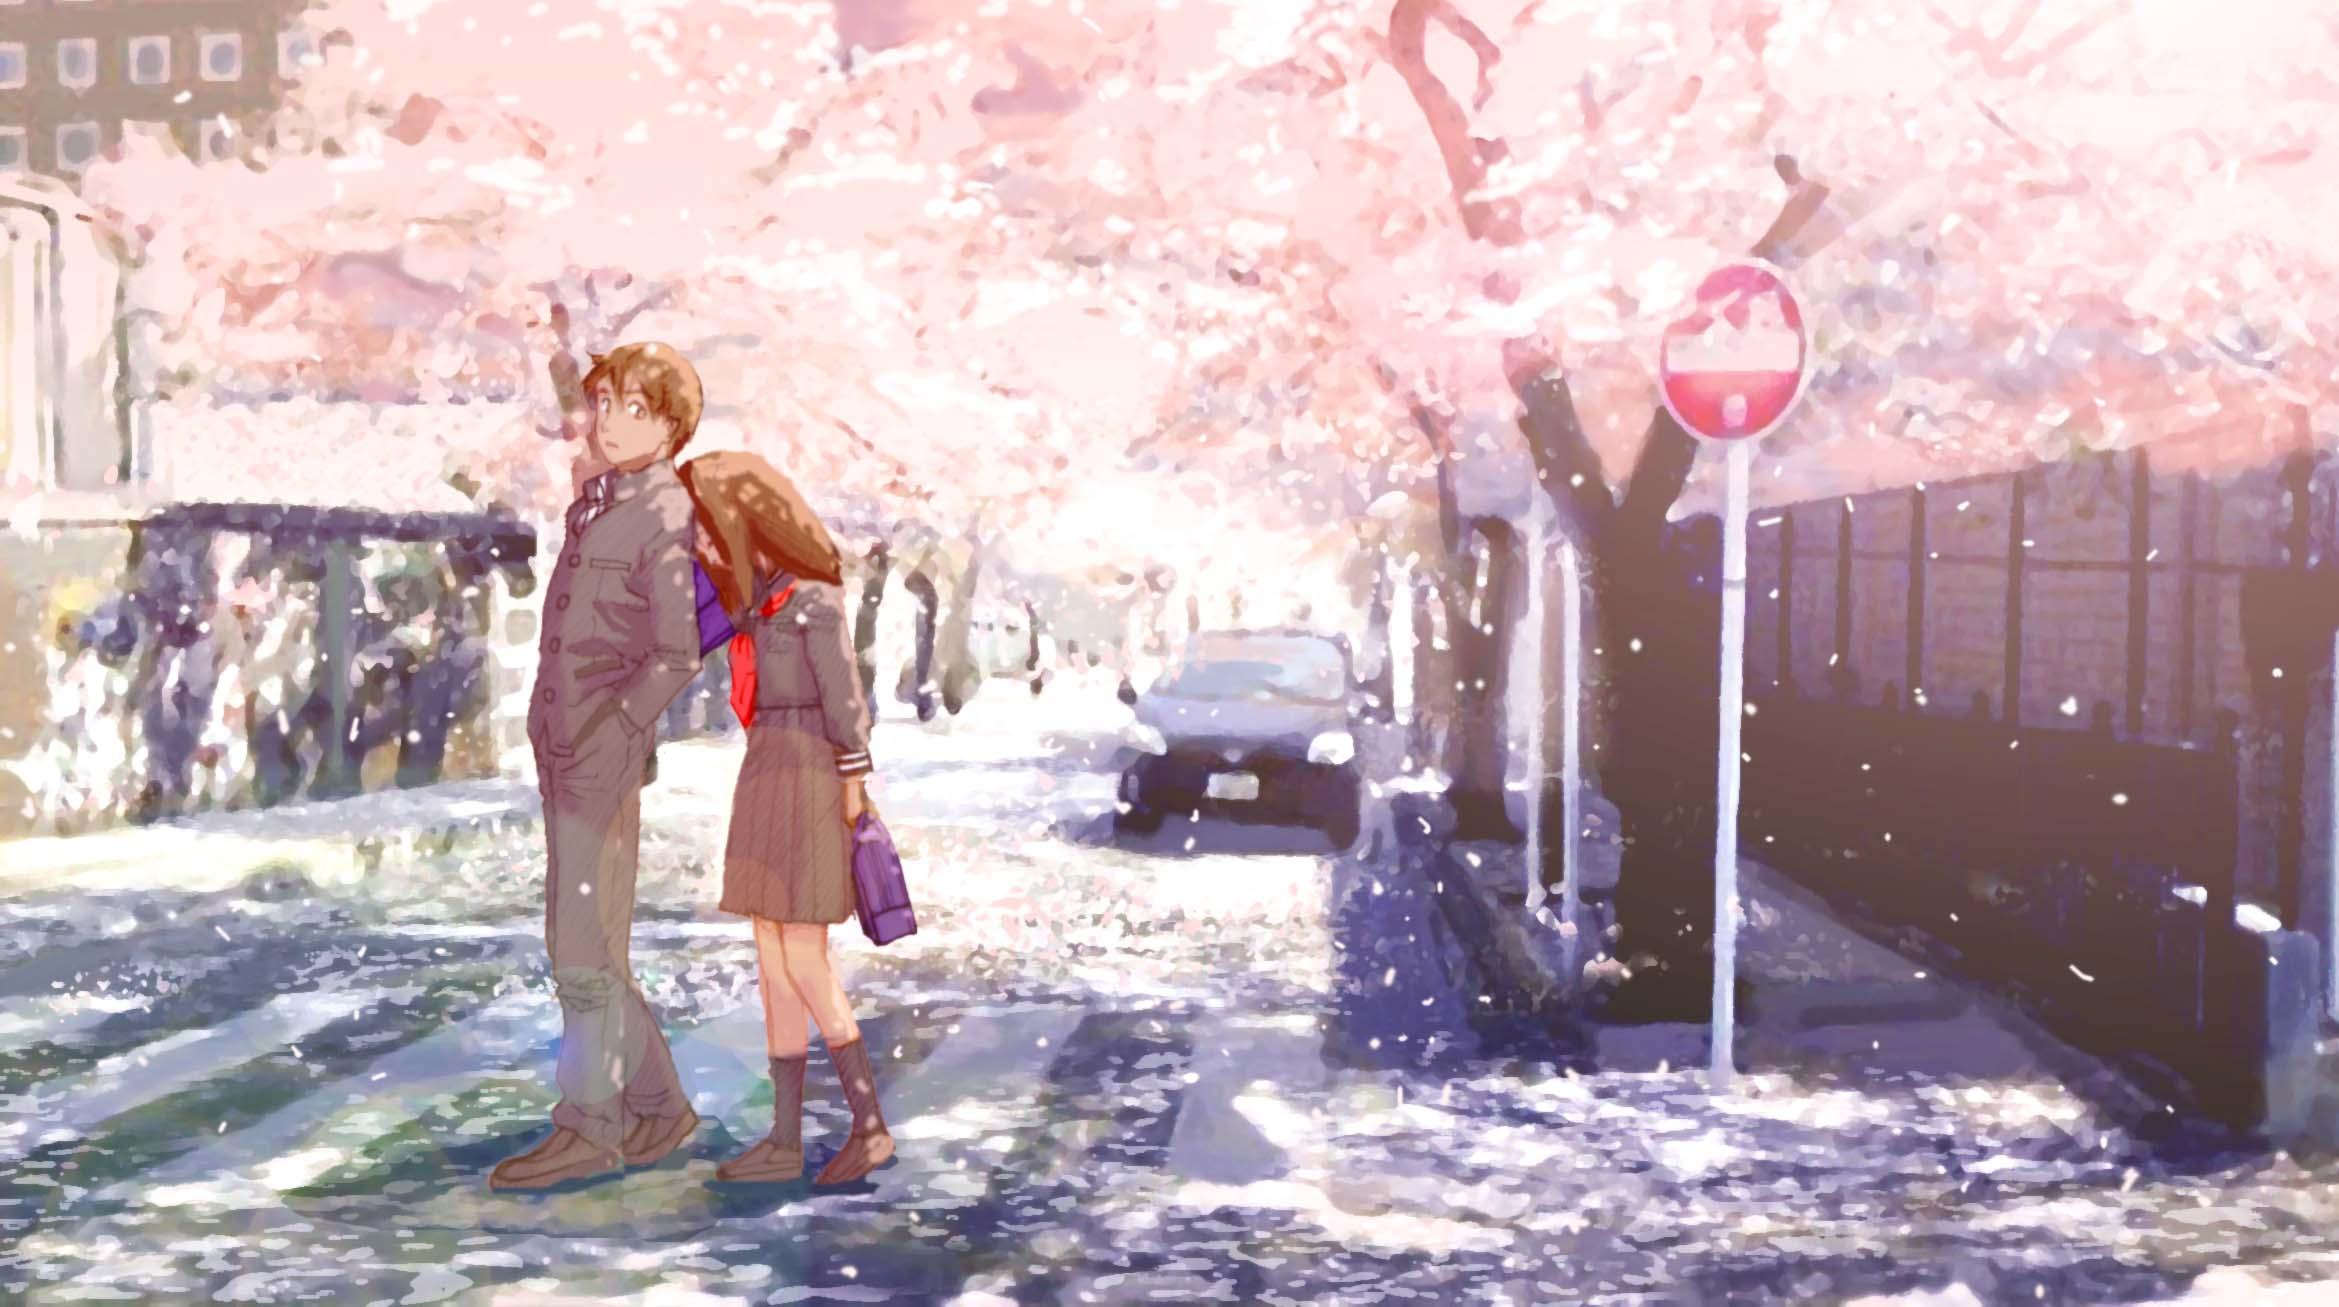 Sayonara Memories Wallpaper 716778 Zerochan Anime Image Board